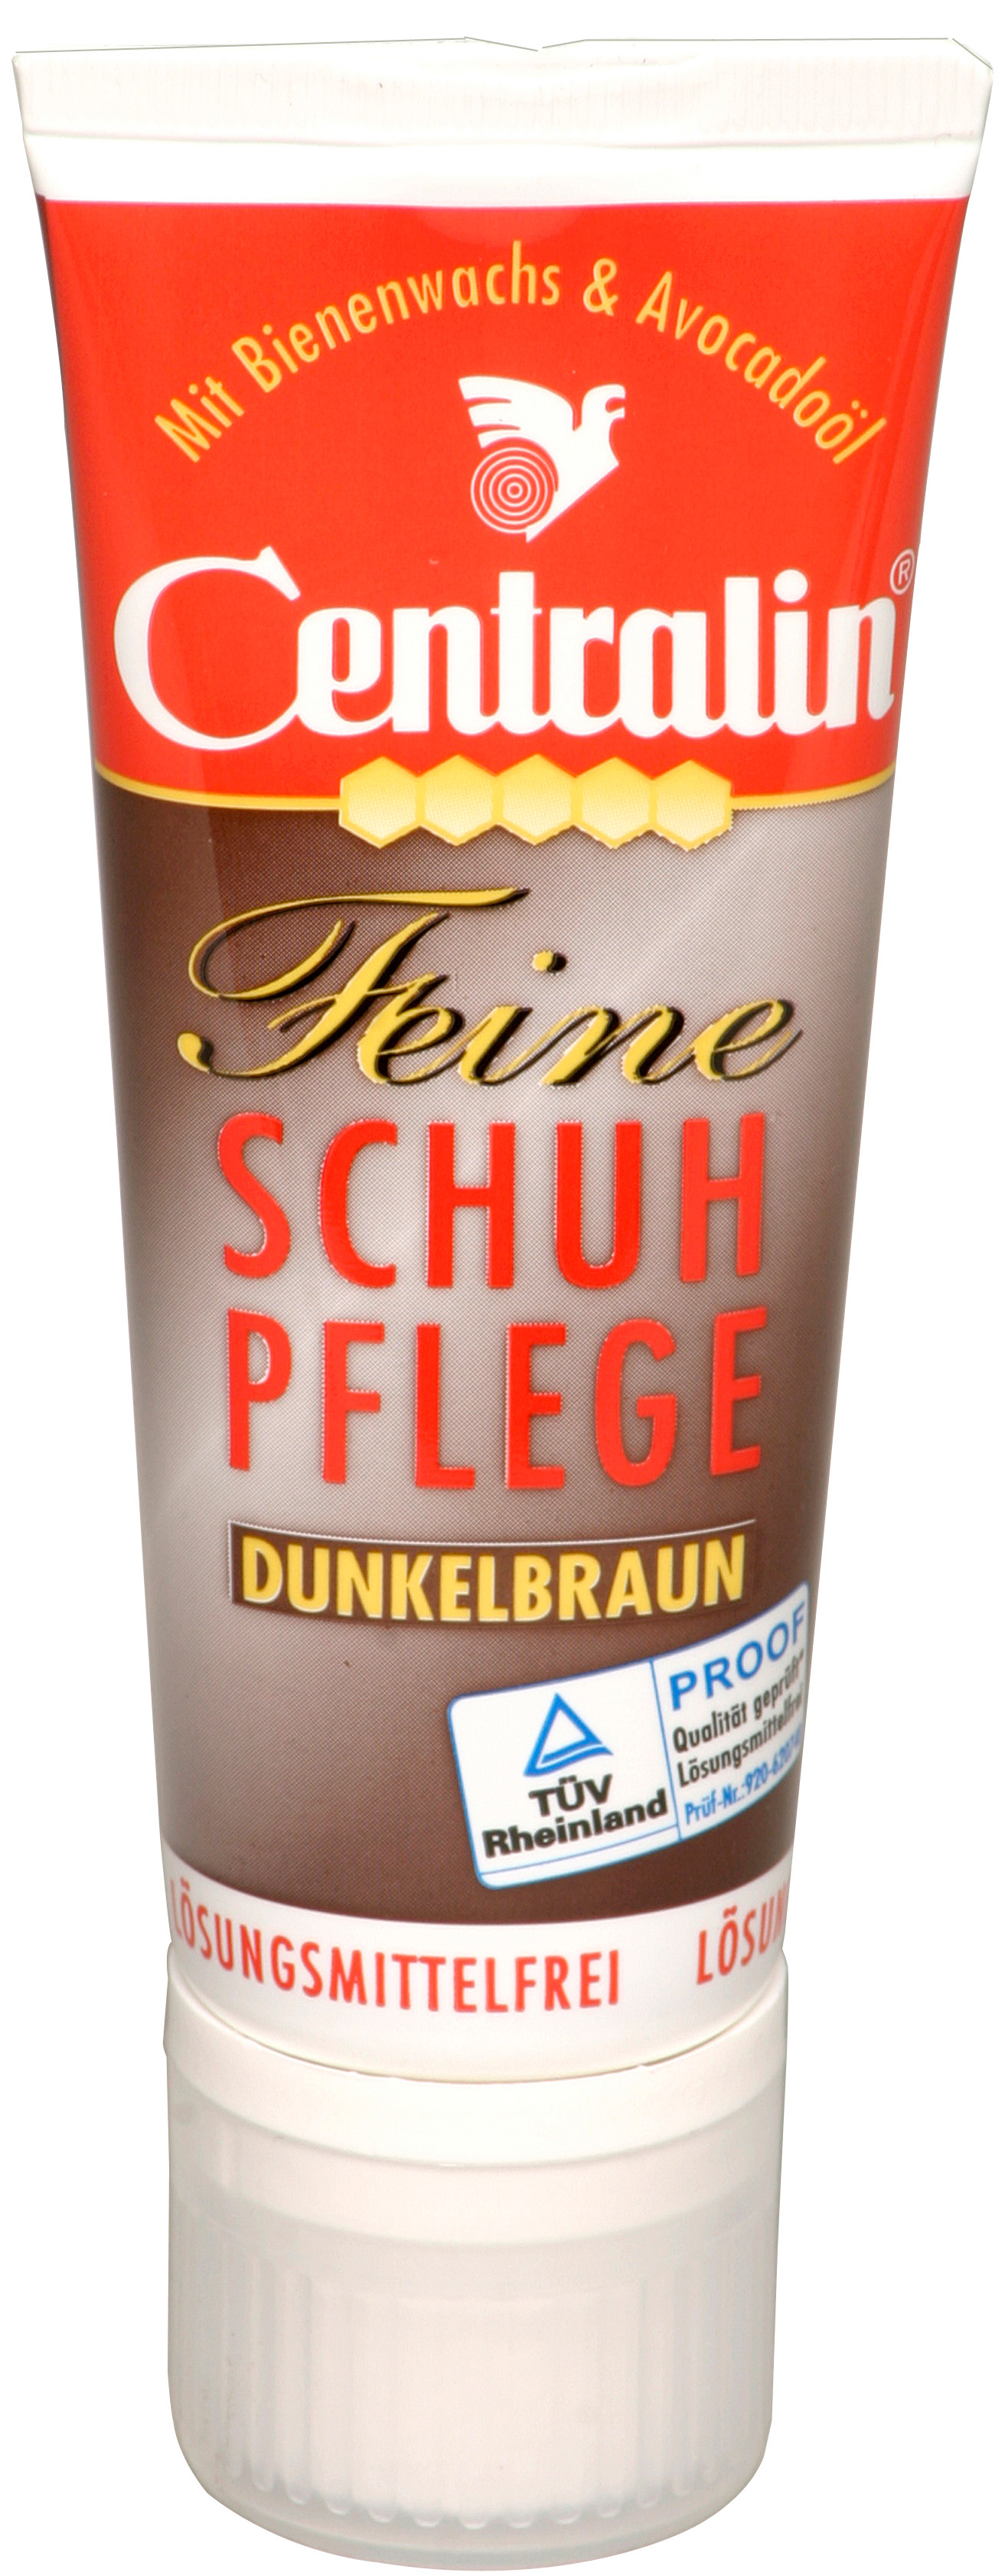 00675 - Centralin Schuhcreme 75 ml Tube -braun-